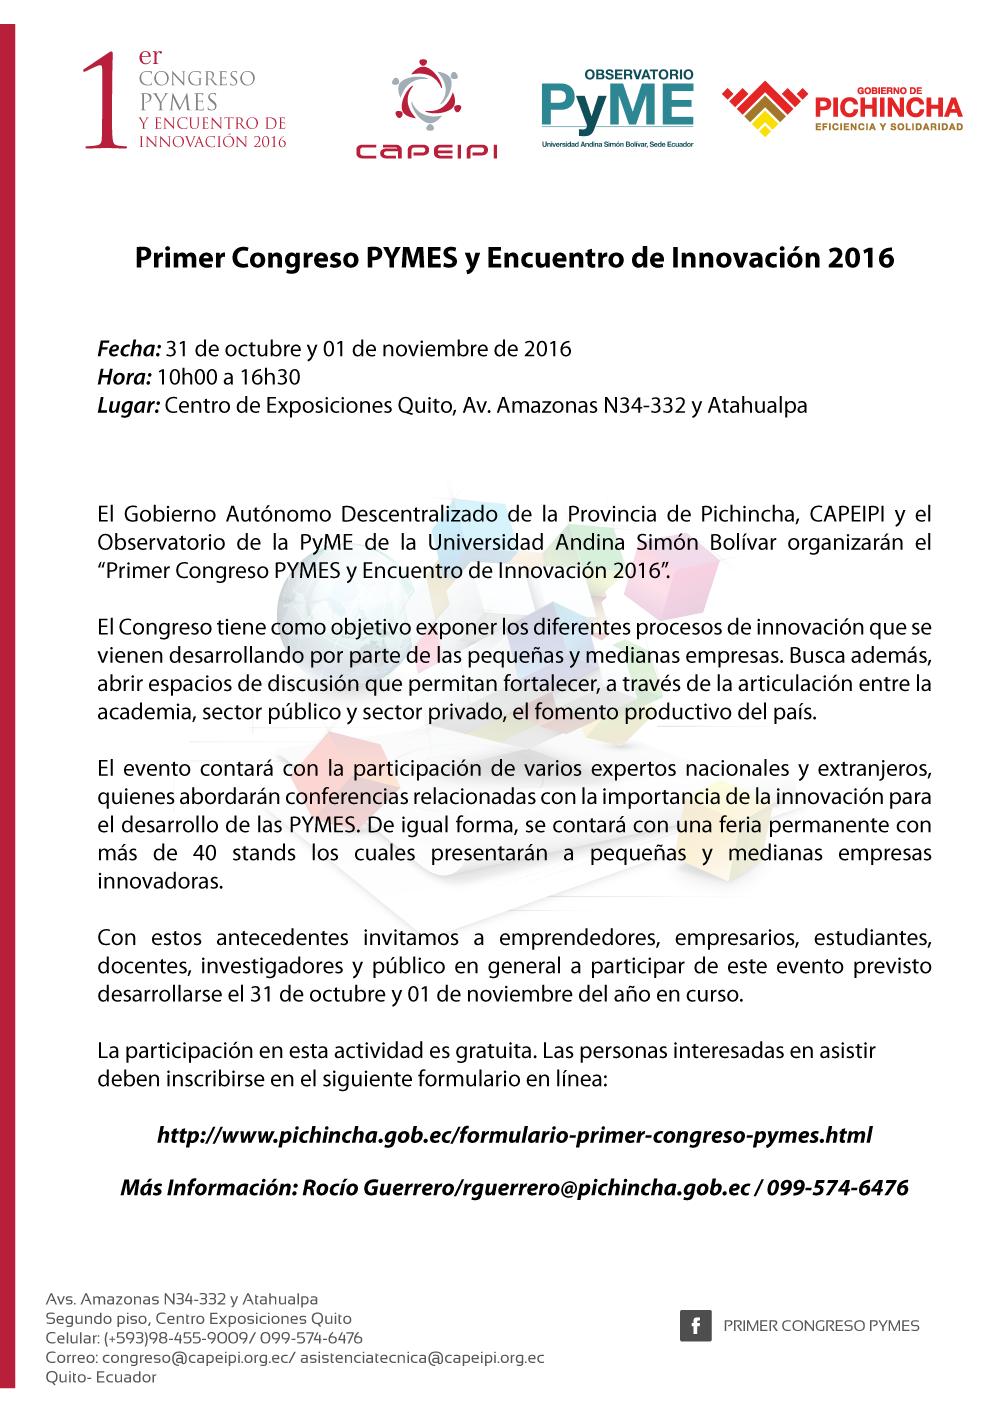 CONVOCATORIA ABIERTA CONGRESO PYMES 2016